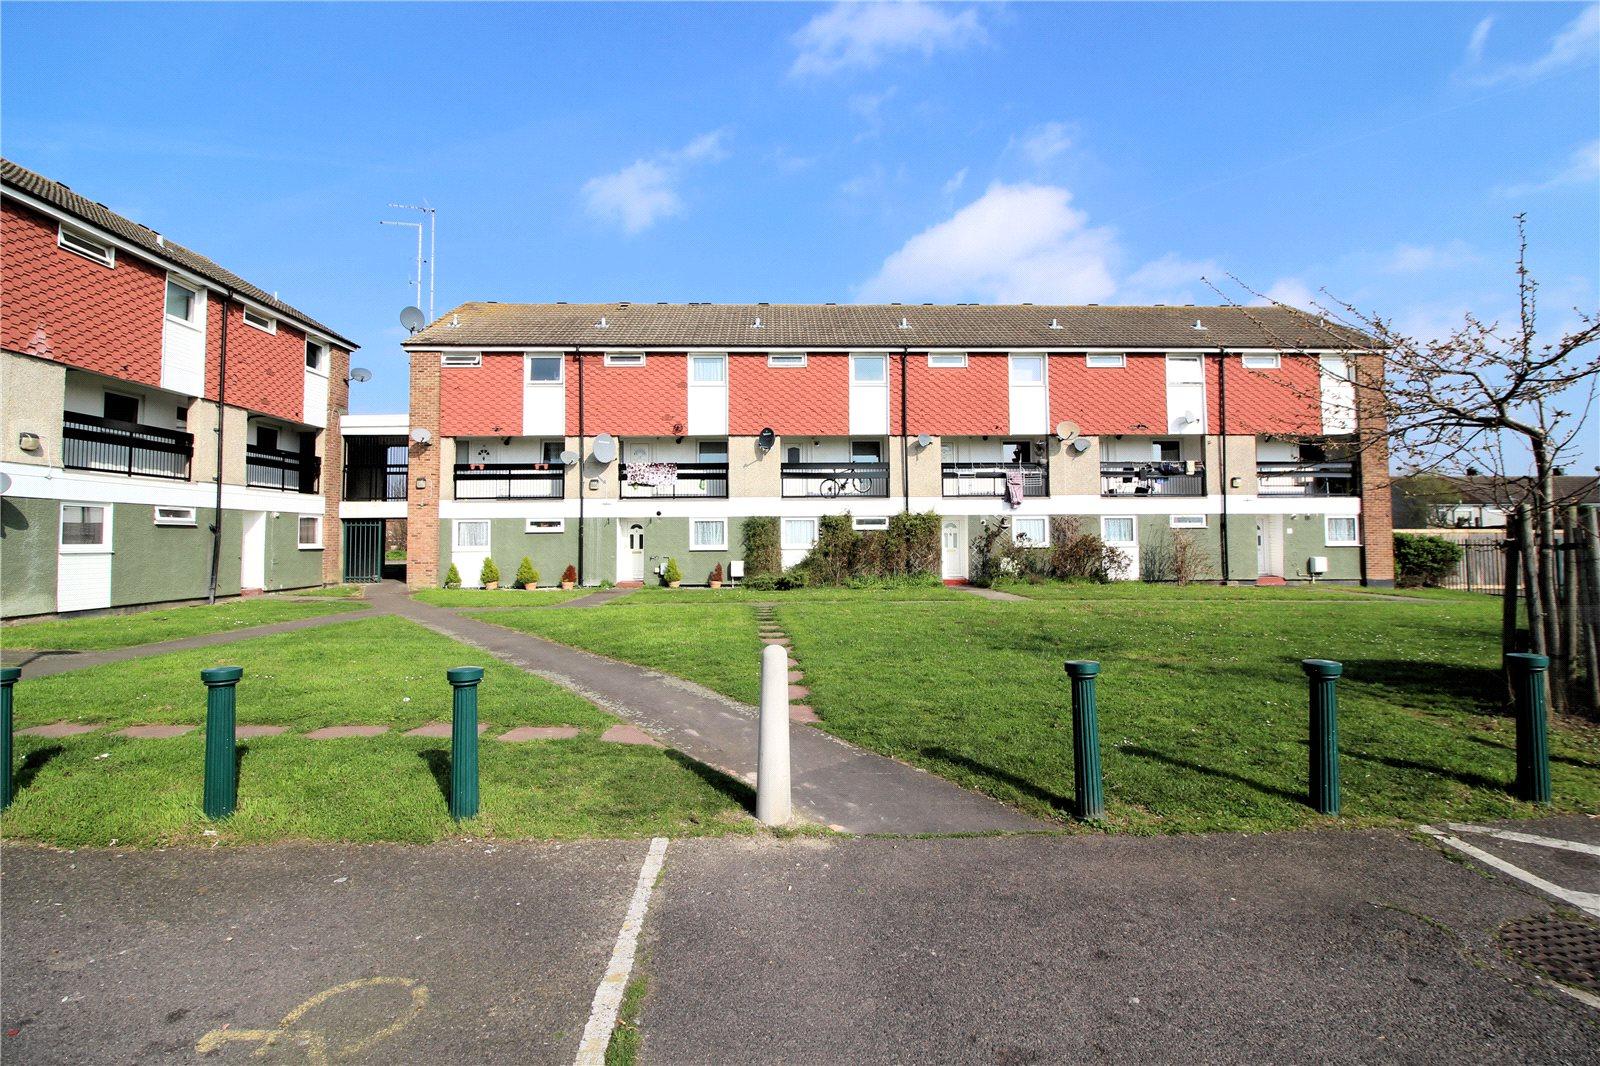 Dale View, Slade Green, Kent, DA8